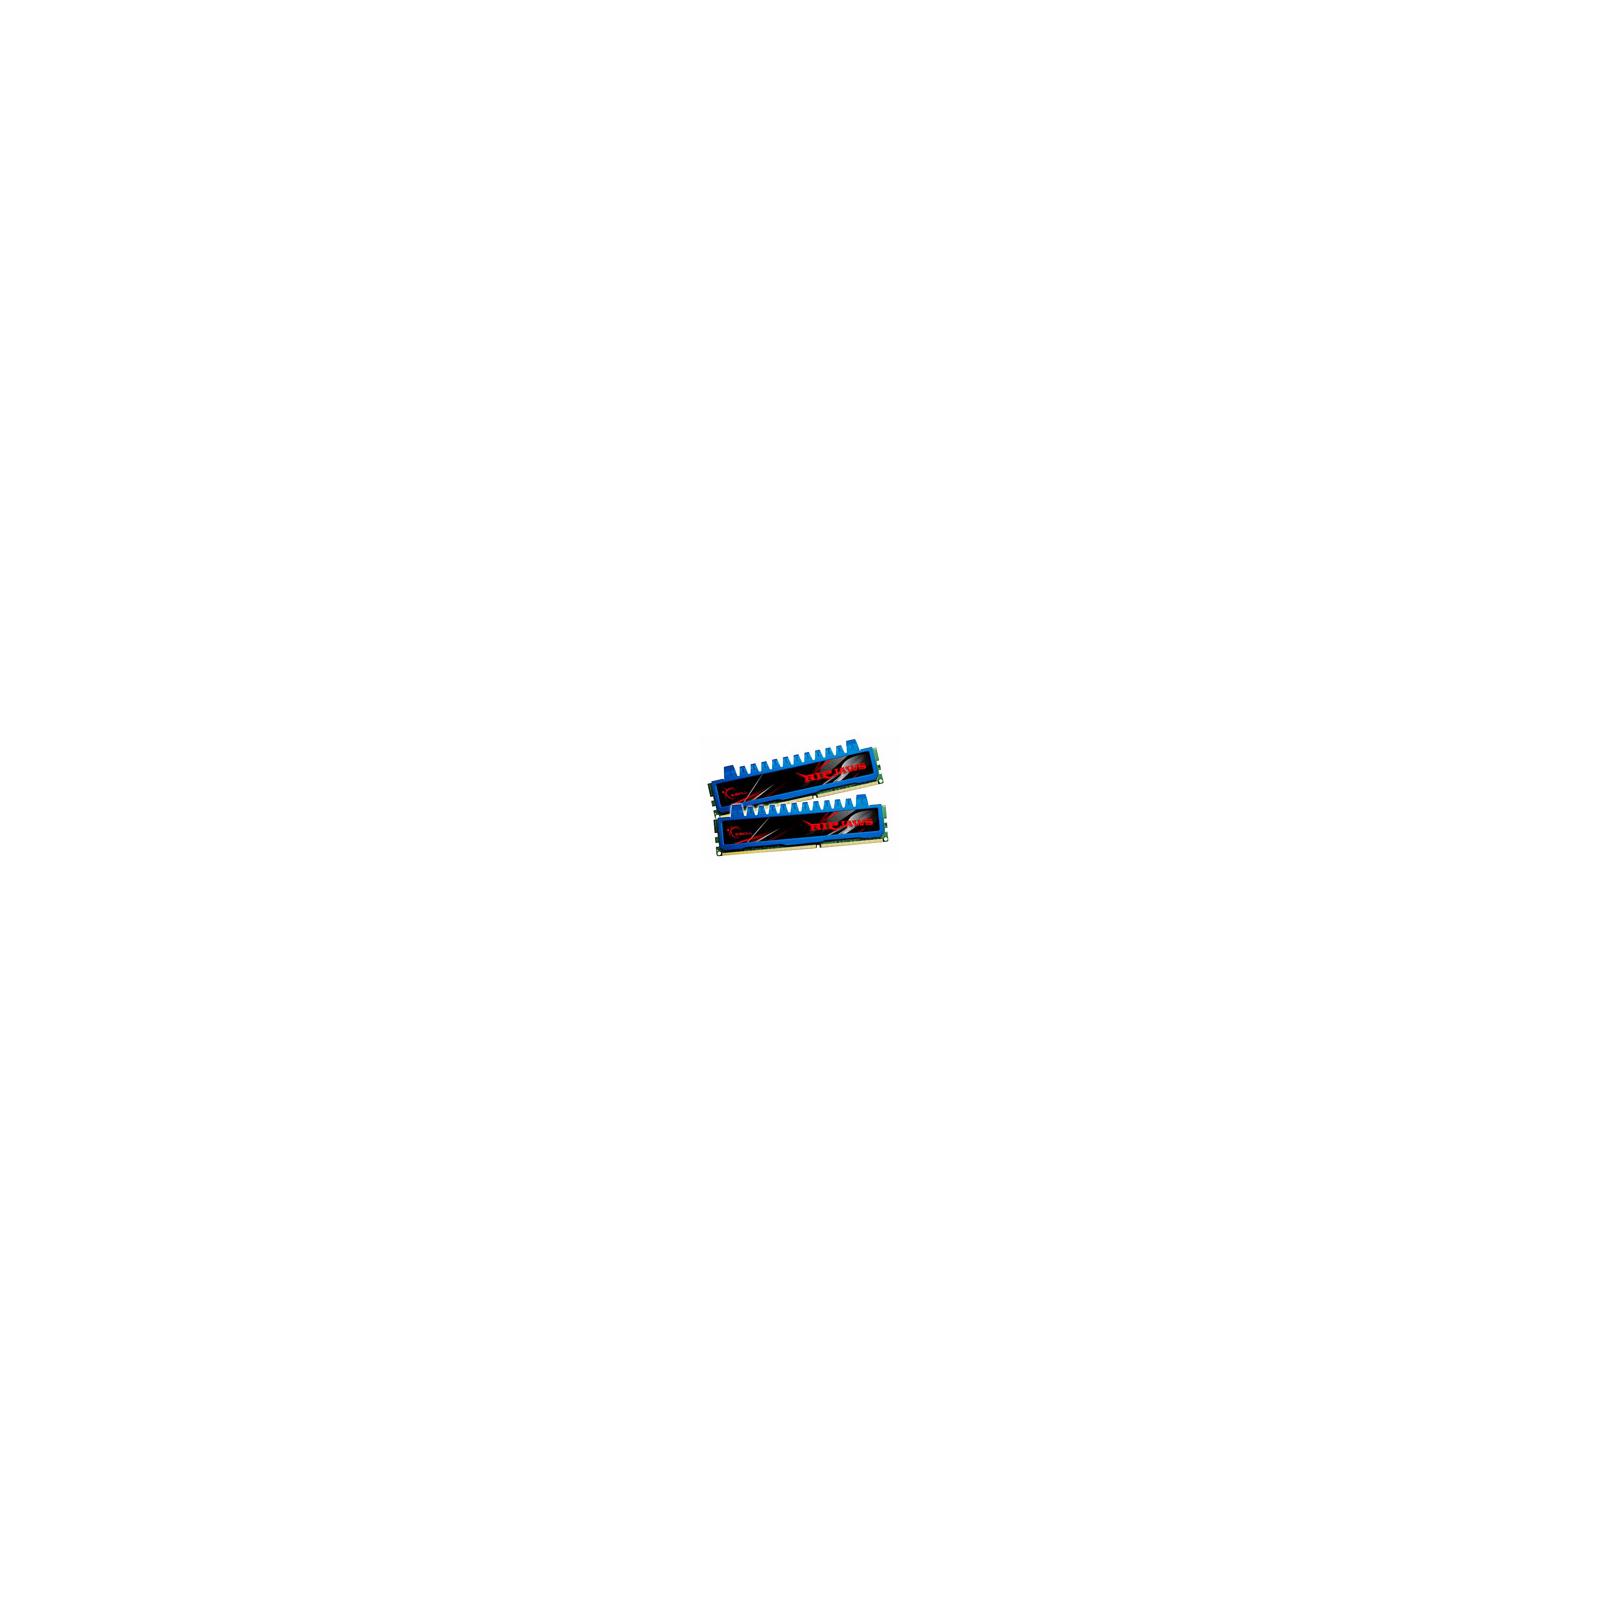 Модуль памяти для компьютера DDR3 4GB (2x2GB) 1600 MHz G.Skill (F3-12800CL8D-4GBRM)